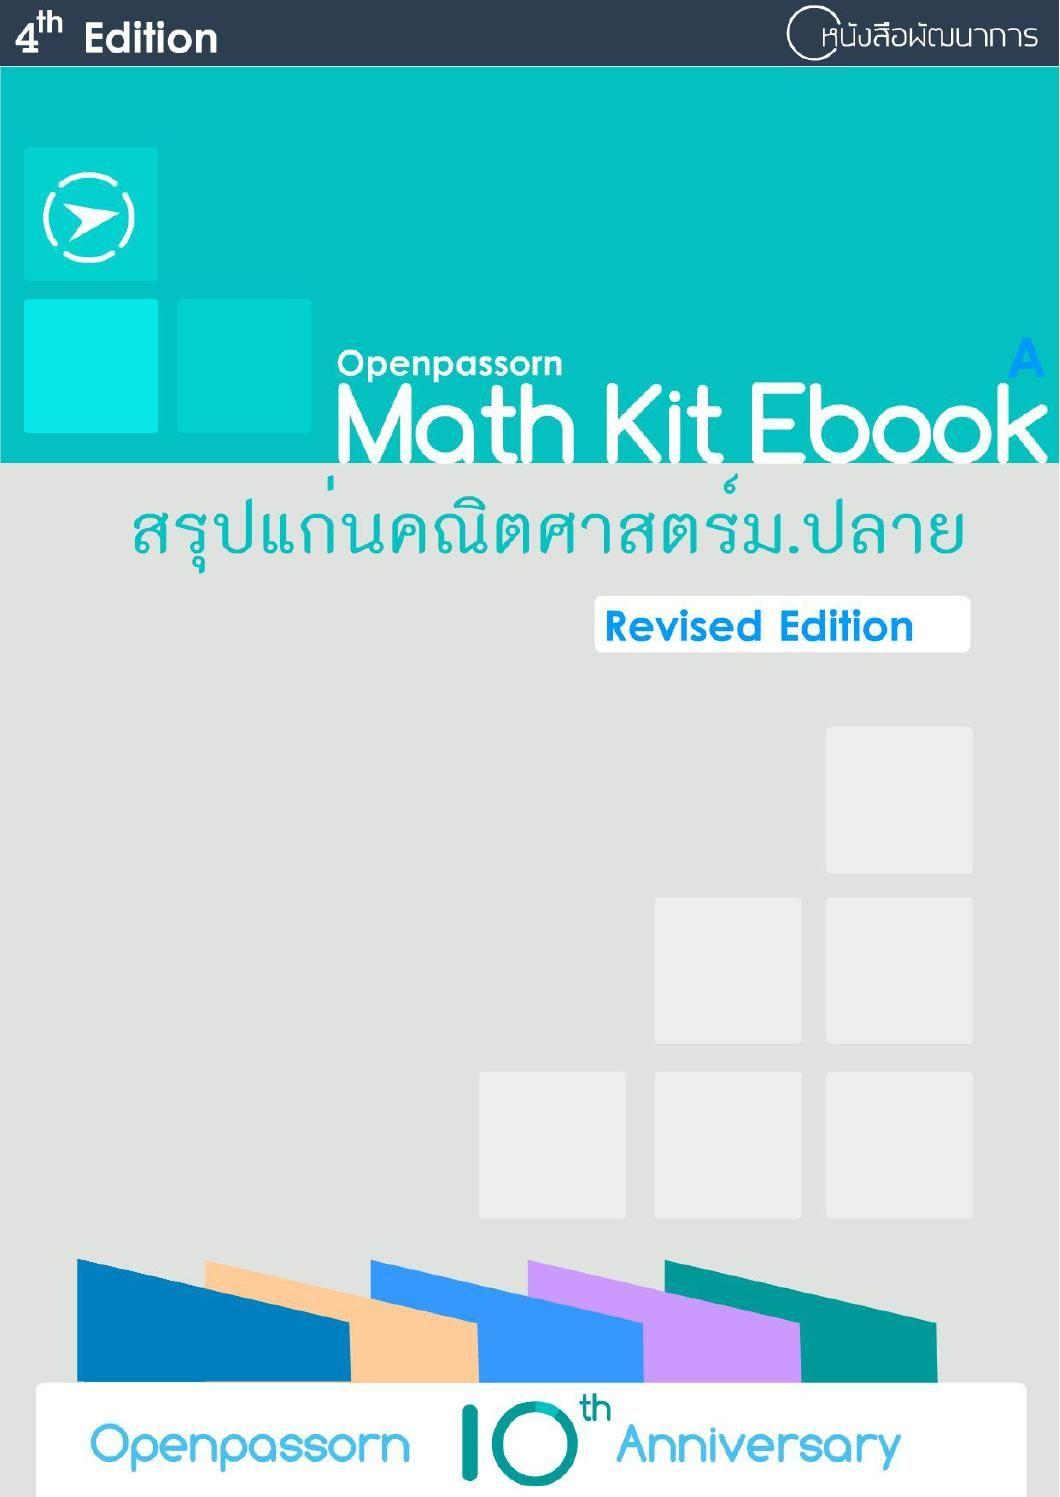 Math revised edition 1 คณตศาสตร